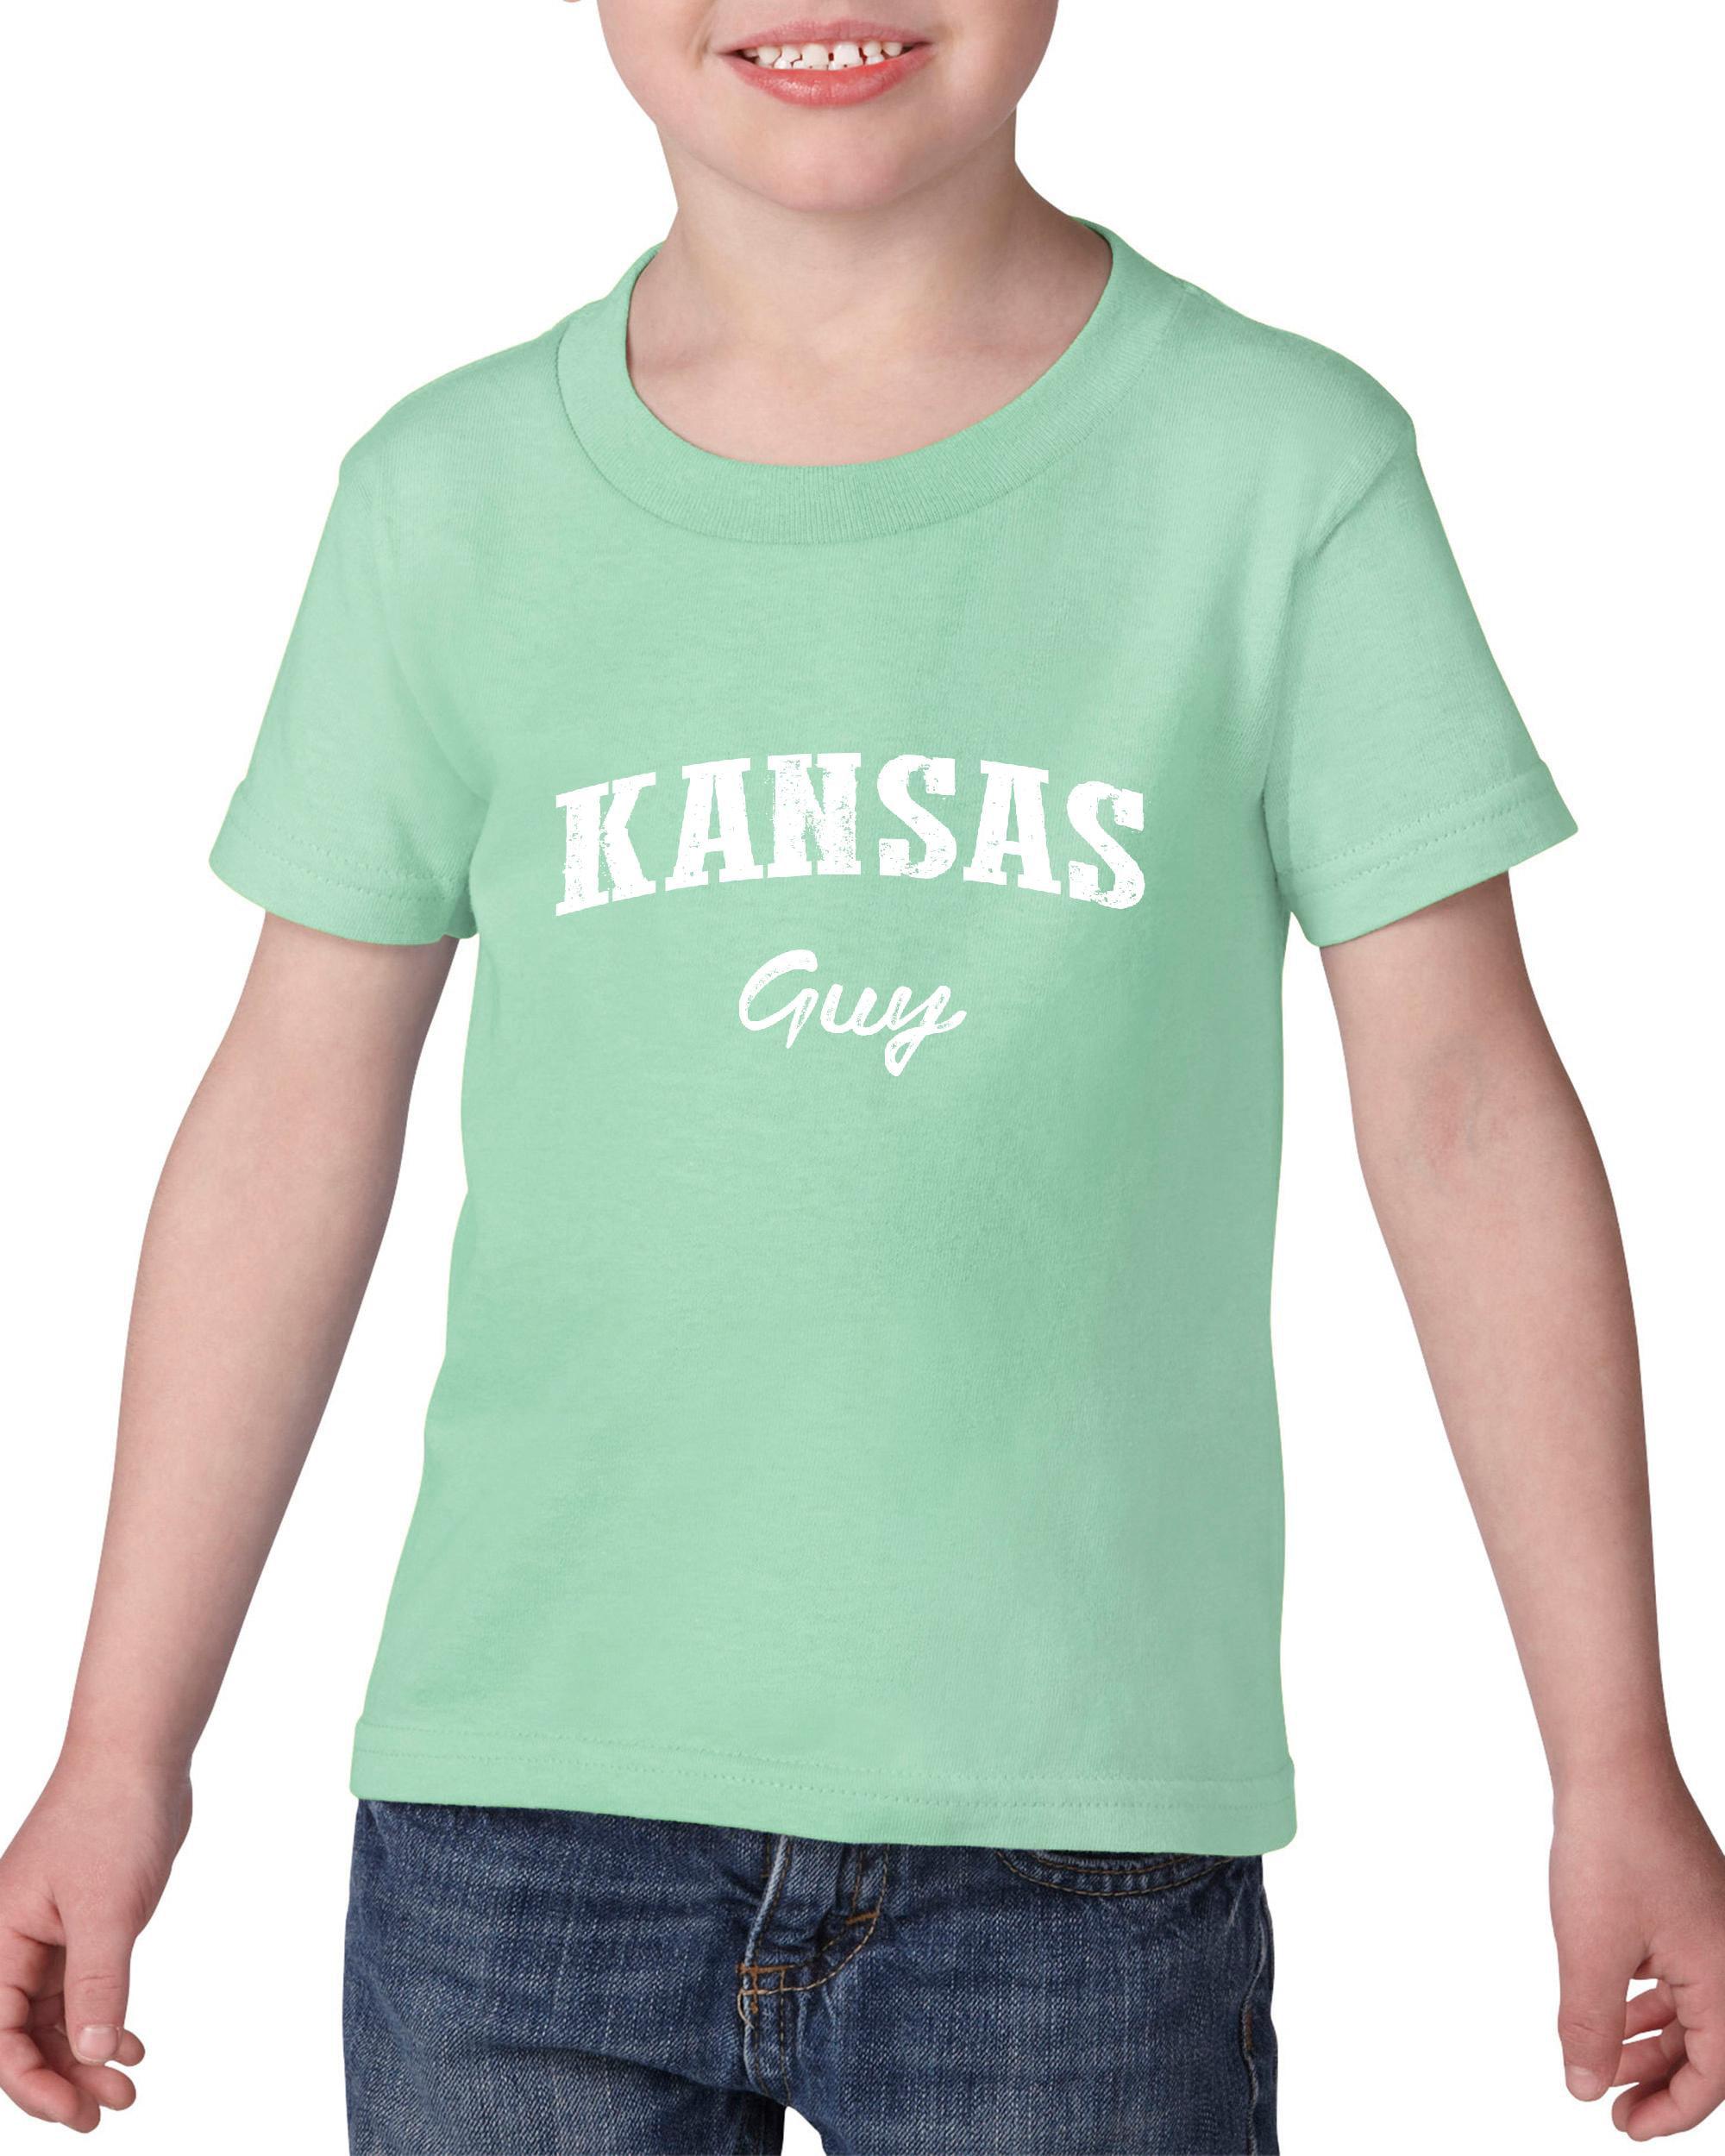 Artix KS Guy Kansas Map Wichita Topeka Flag  Jayhawks Home Kansas University KU Heavy Cotton Toddler Kids T-Shirt Tee Clothing